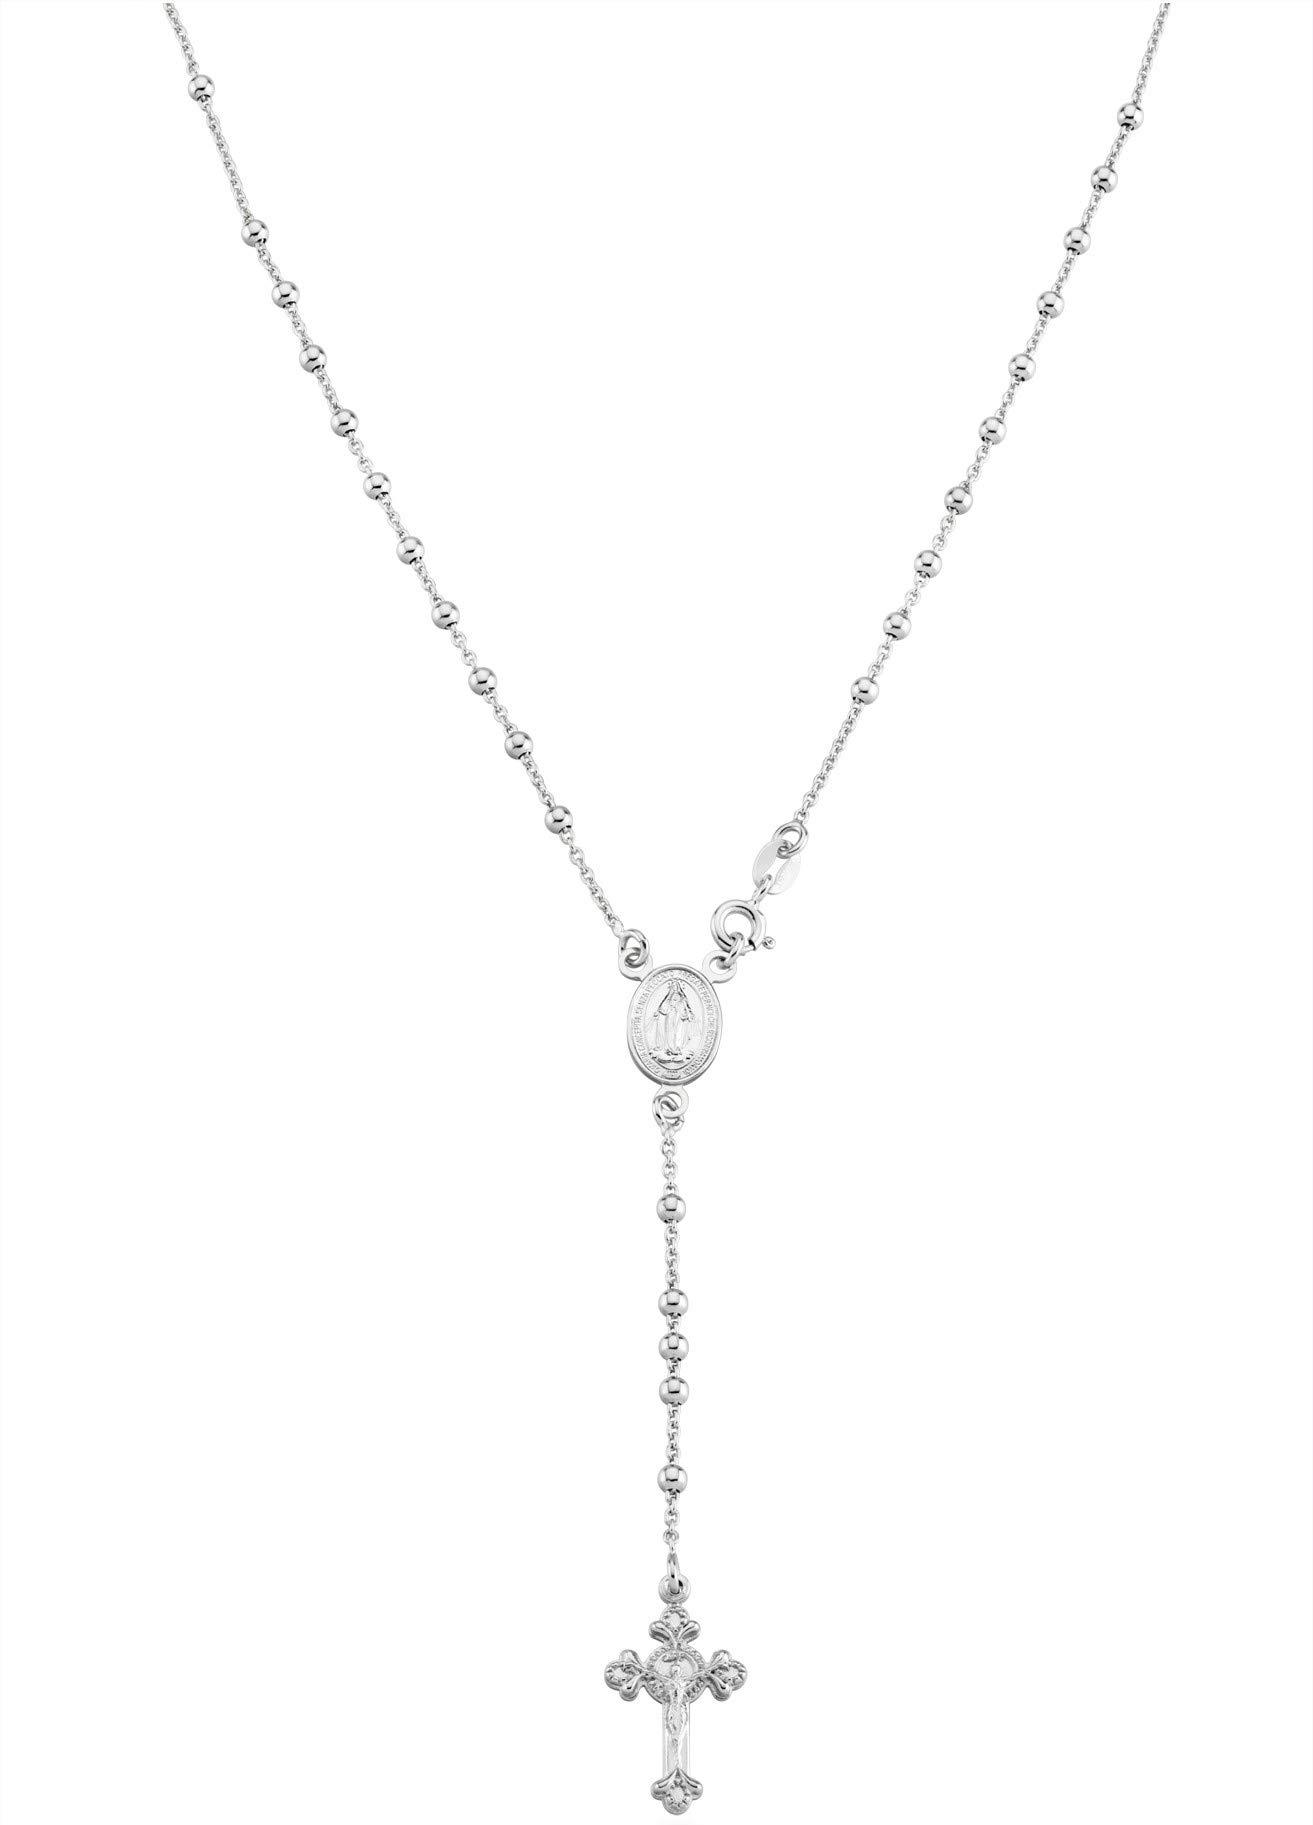 Miabella 925 Sterling Silver Italian Rosary Bead Cross Y Necklace Chain for Women Men, 20 inch by Miabella